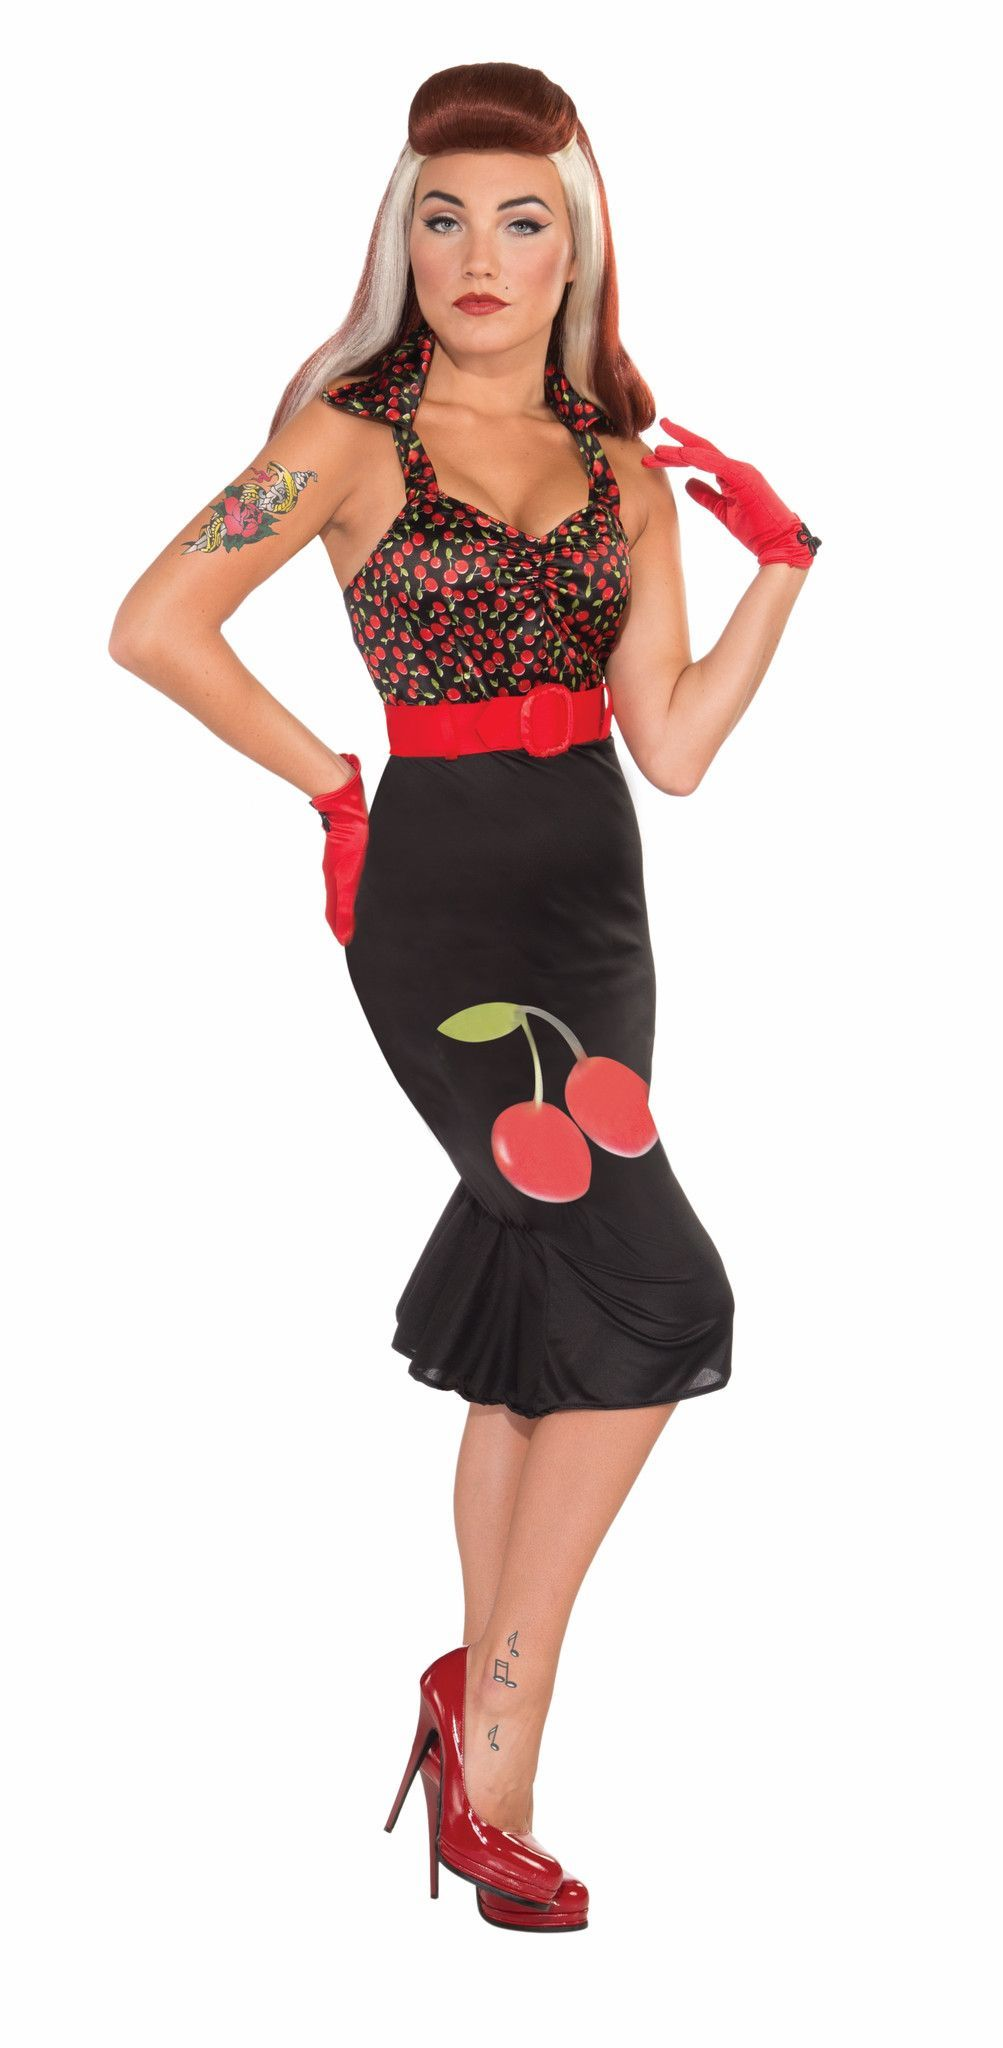 Retro pin up girl cherry anne costume dress adult rockabilly retro pin up girl cherry anne costume dress adult solutioingenieria Images